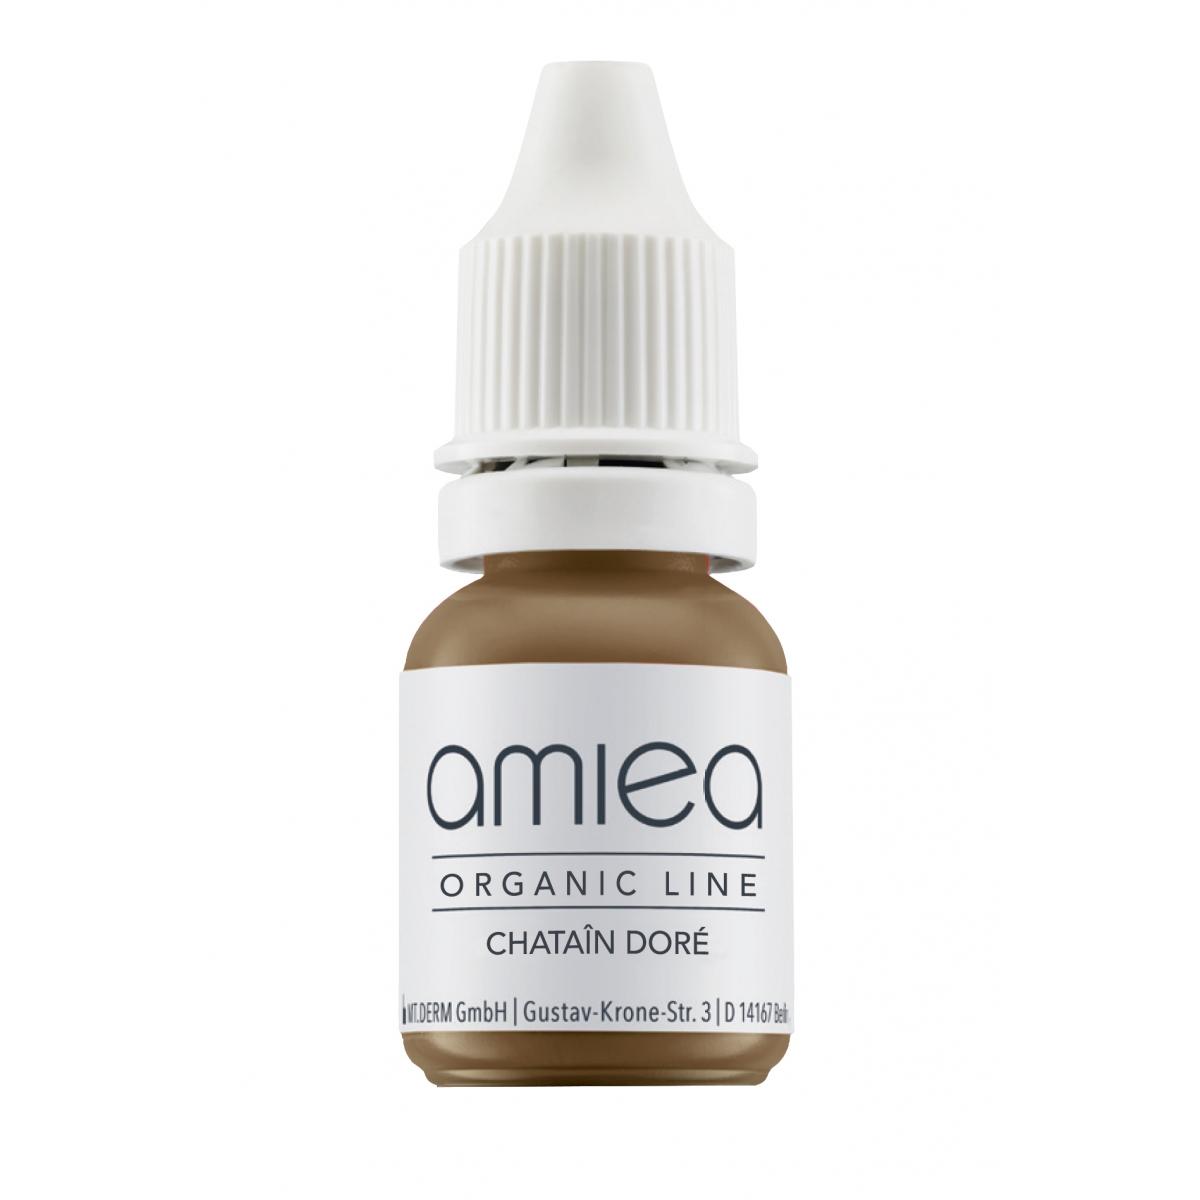 Organicline (5 ml)  - PIGMENTS AMIEA ORGANICLINE CHATAIN DORE, Flacon 5 ml